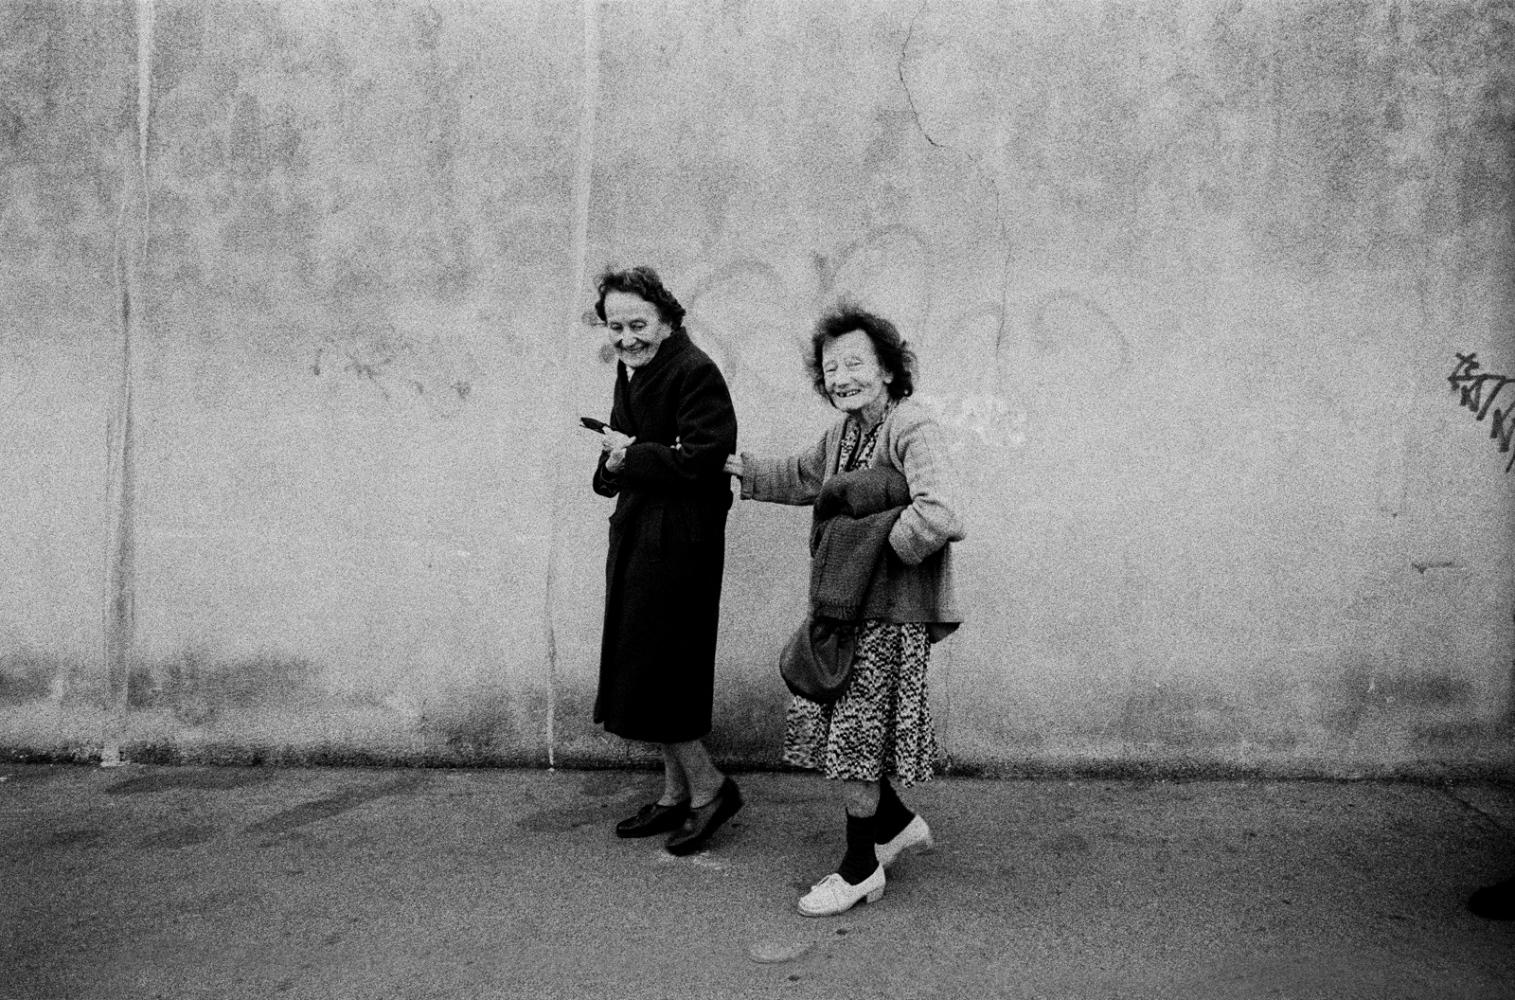 Art and Documentary Photography - Loading 031_Marseille___Fabio_Sgroi.jpg